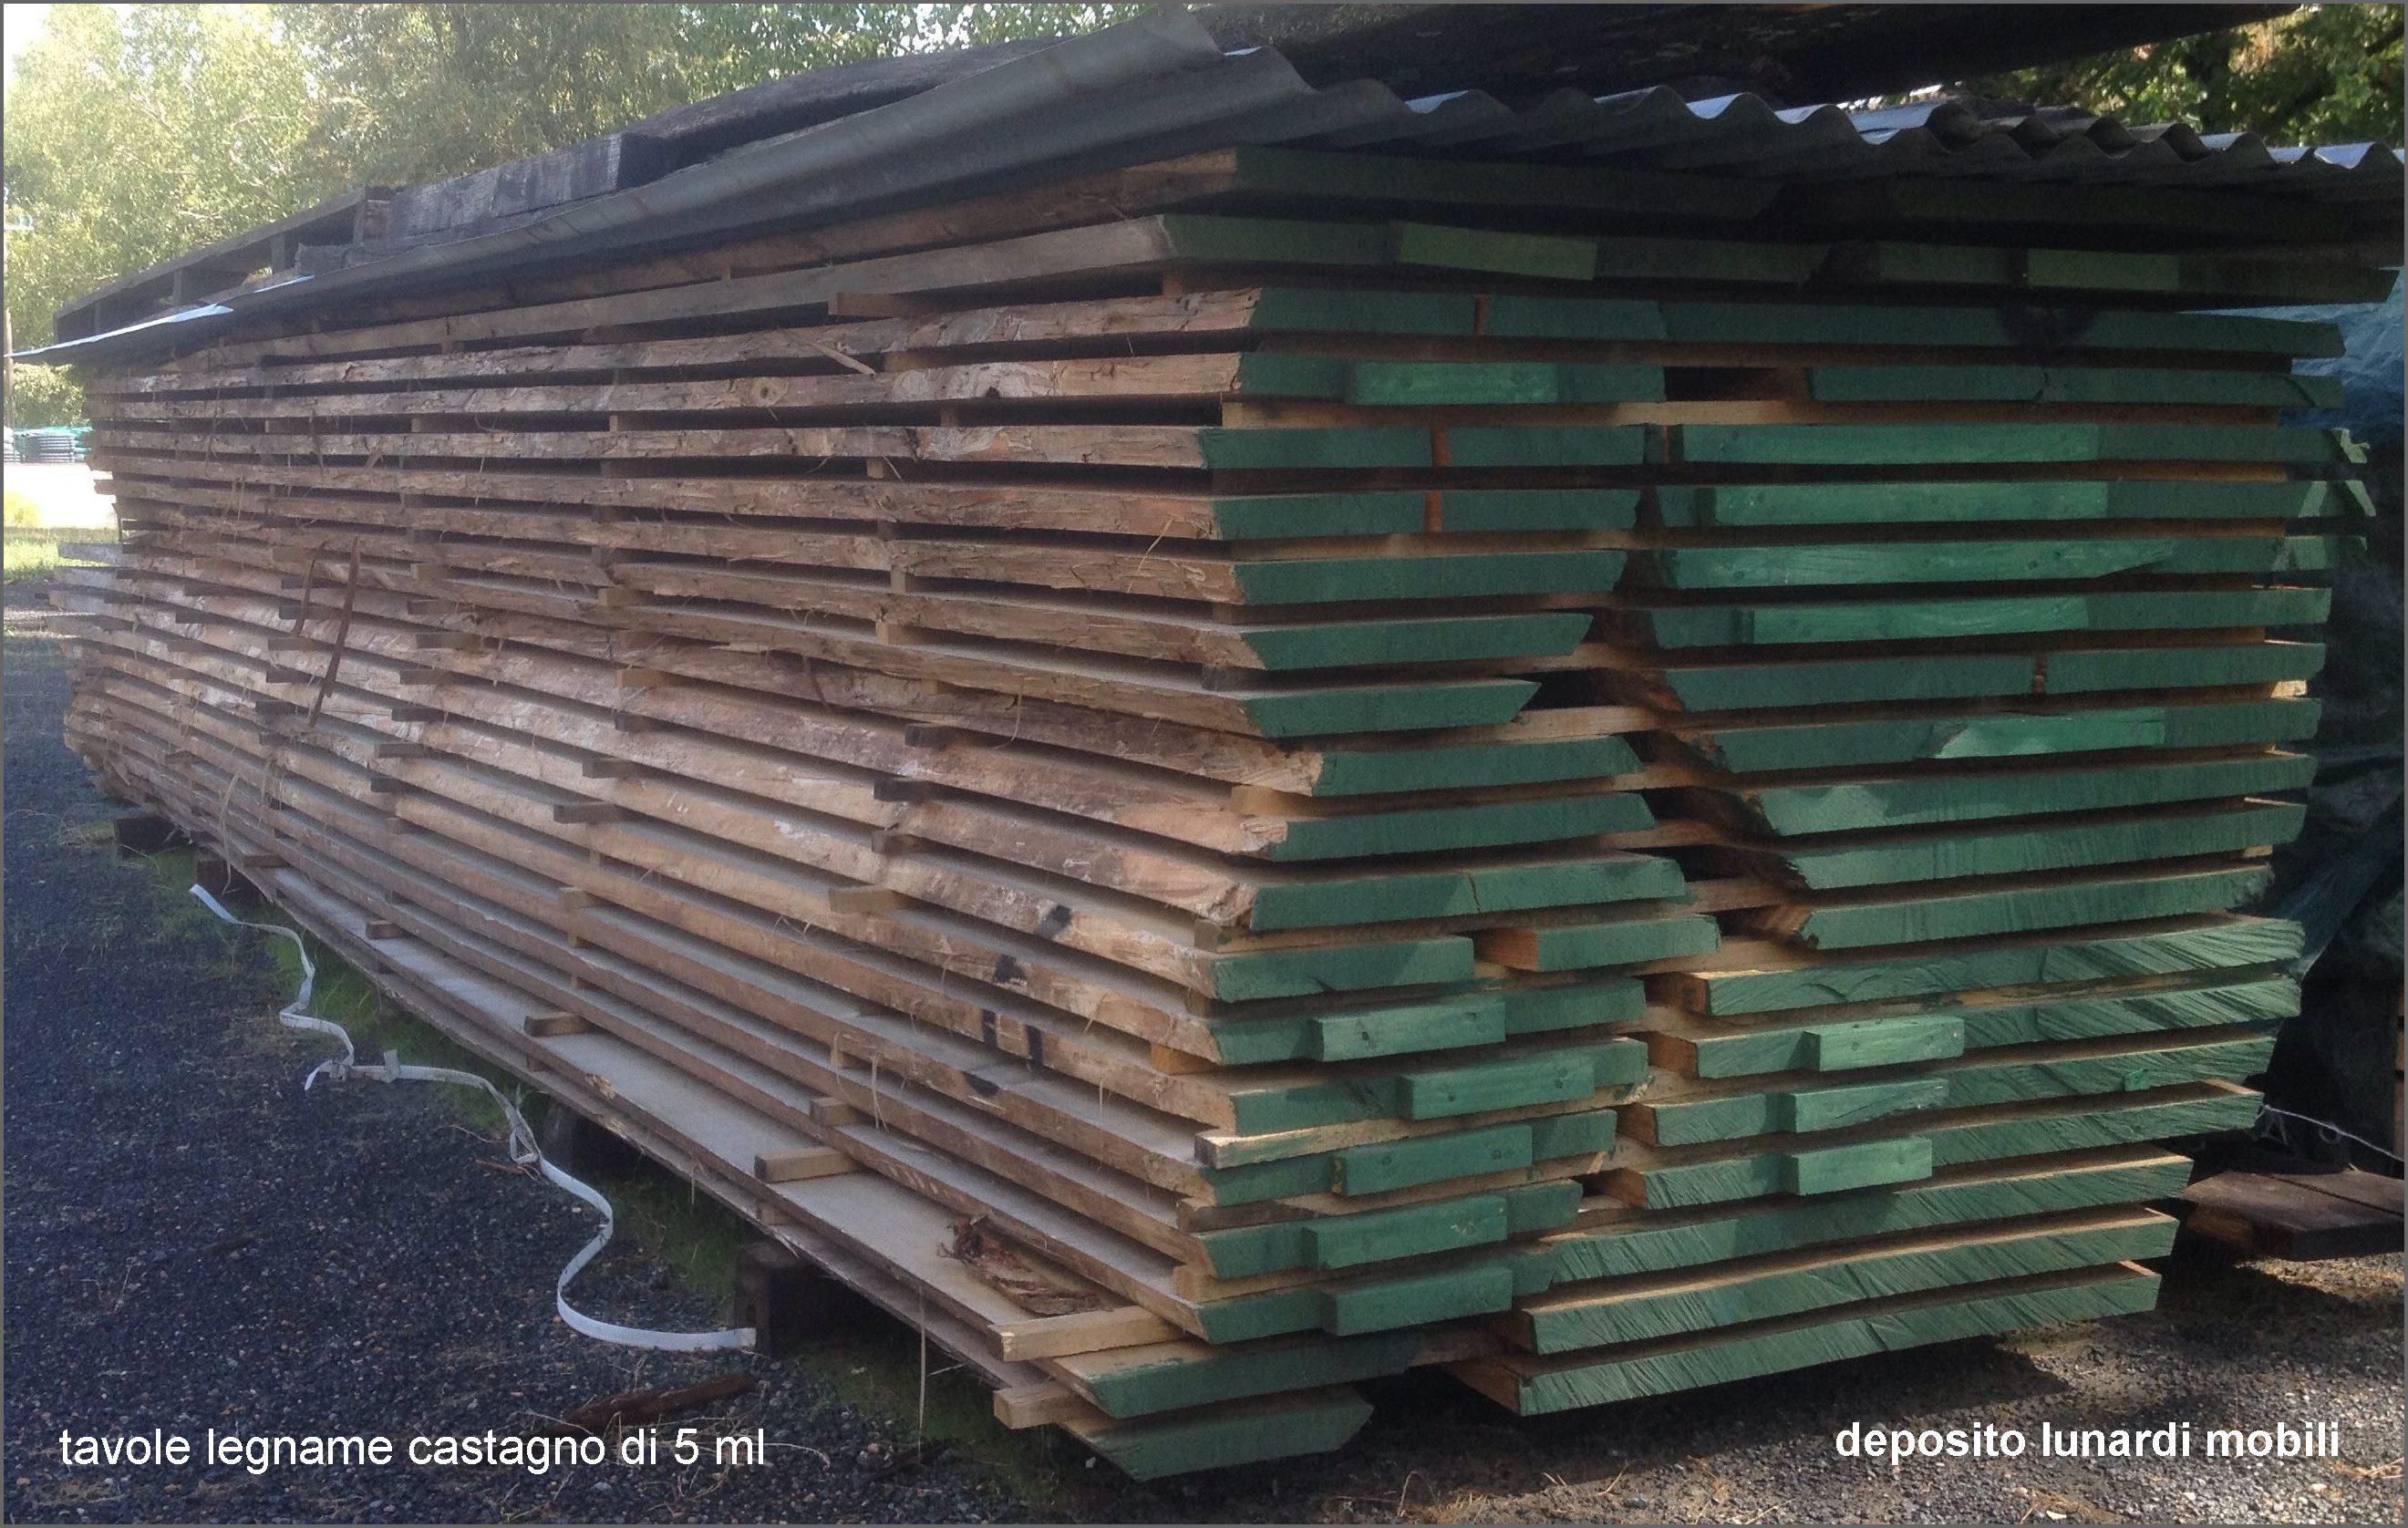 5 motivi per scegliere arredi in legno lunardi mobili for Arredi in legno